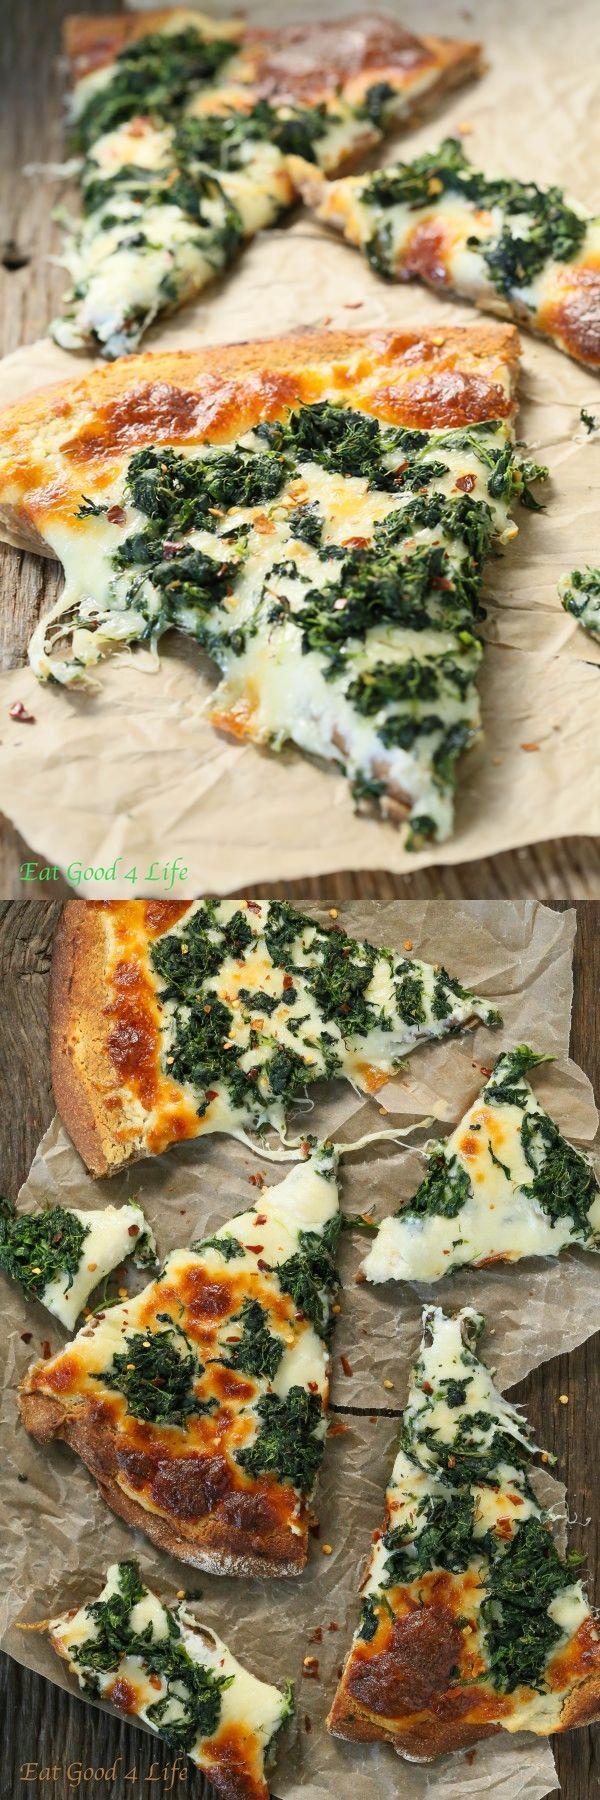 4 heads Garlic. 1 Pepper flakes. 2 Pizza dough, whole wheat. 4 tsp Olive oil. 32 oz Mozzarella cheese, part skim. 16 oz Ricotta cheese. 20 oz Cascadian farm frozen spinach, thawed and liquid squeezed.